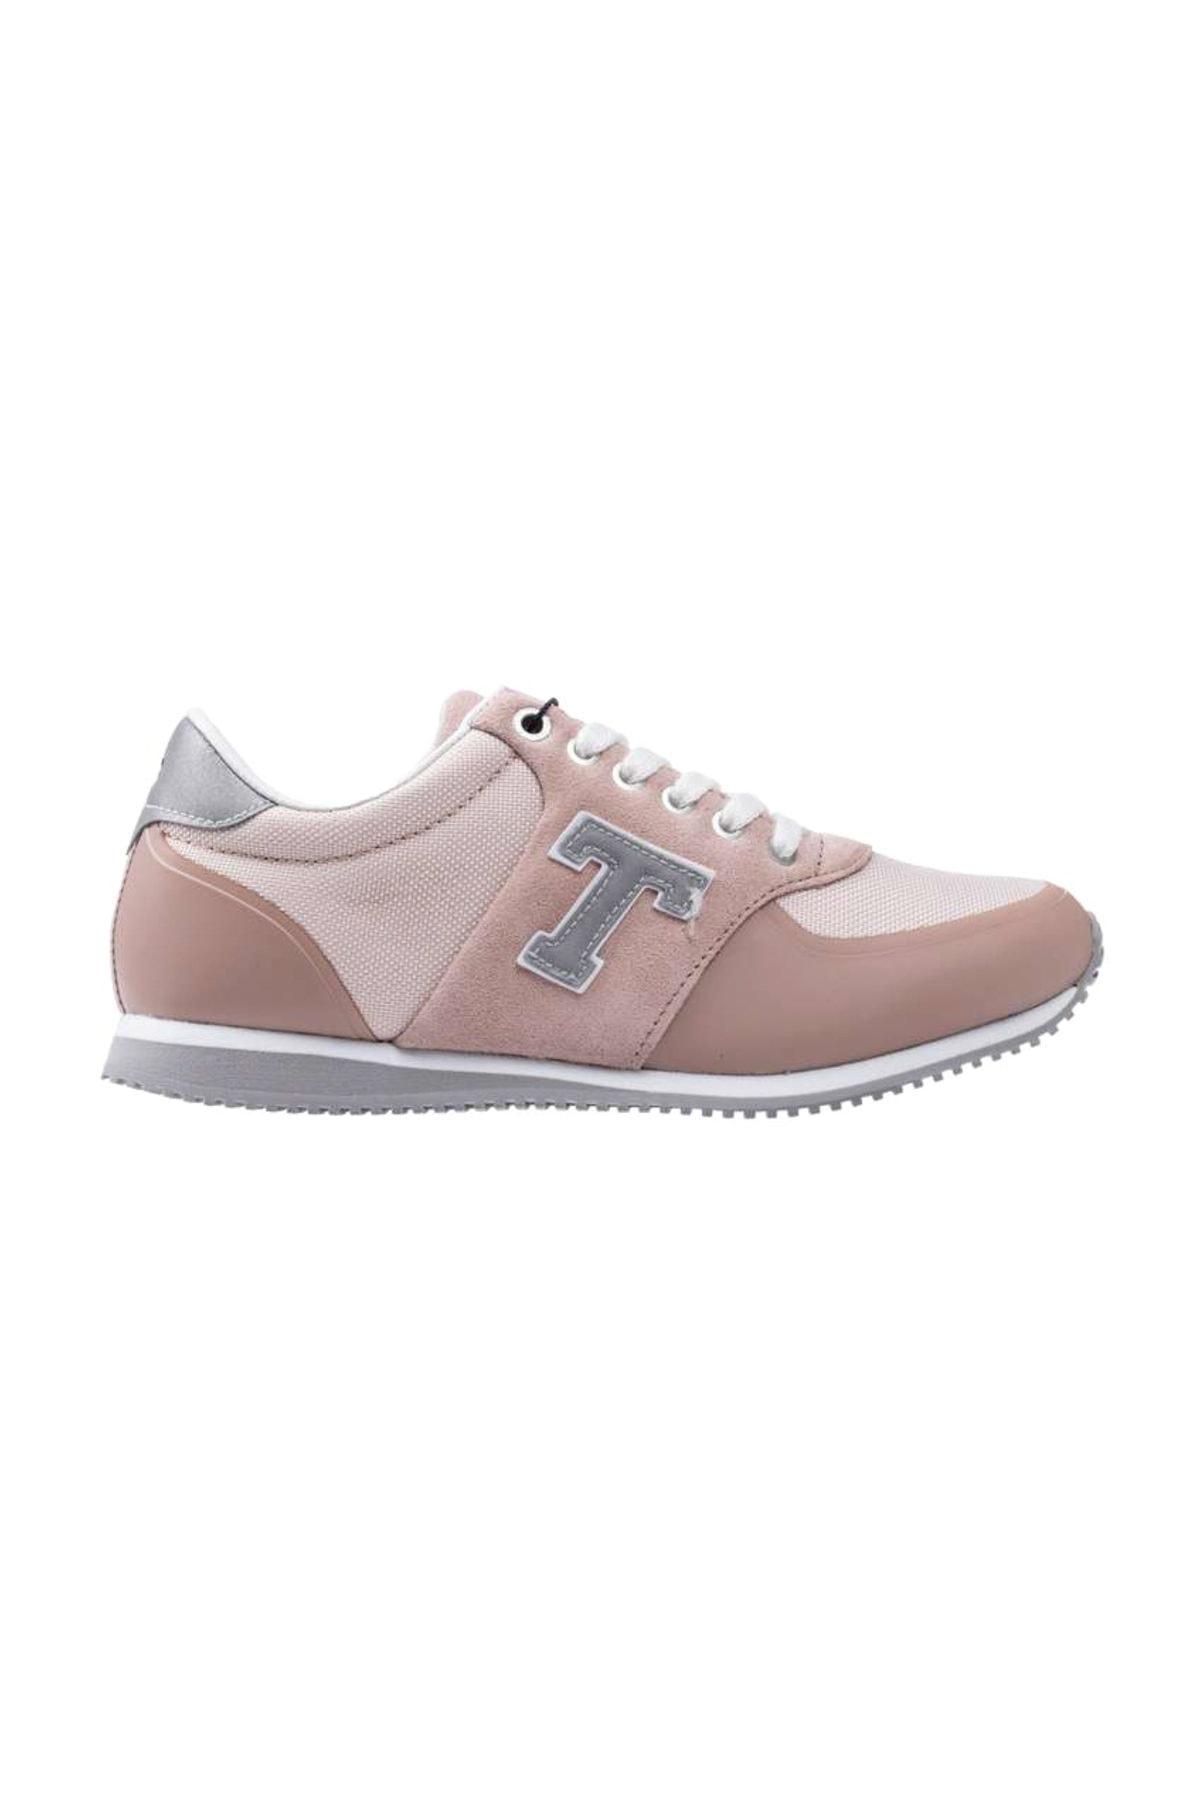 Tommy Hilfiger Kadın Ayakkabı Fw0Fw00859-502 1